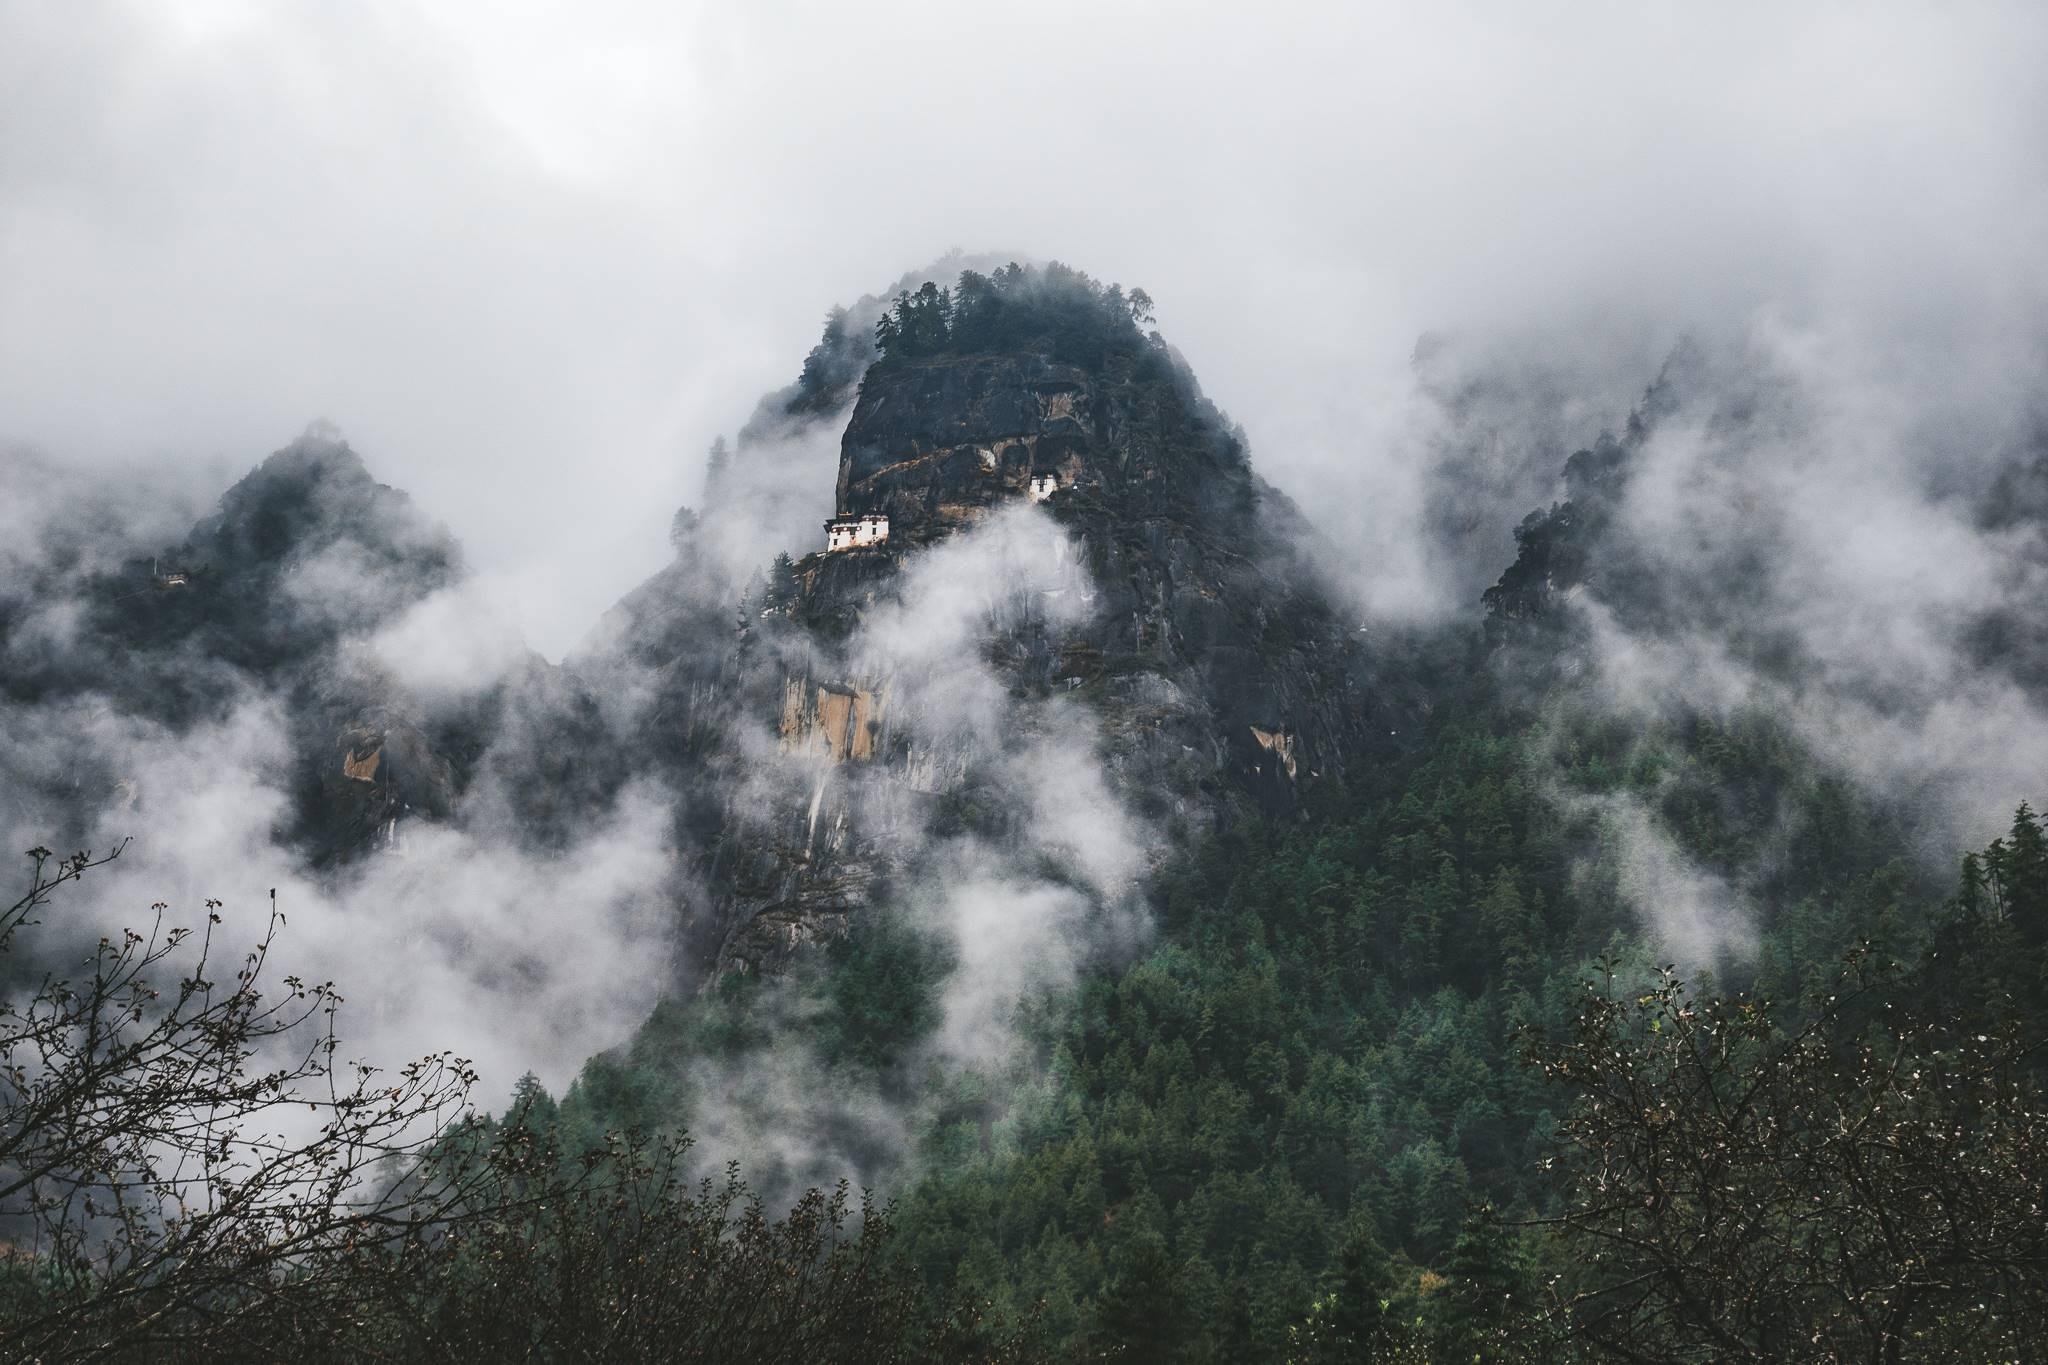 tiger's nest monastery, bhutan, kingdom of bhutan, visit bhutan, how to get to bhutan, druk air, bhutan mountain holidays, bhutan tours